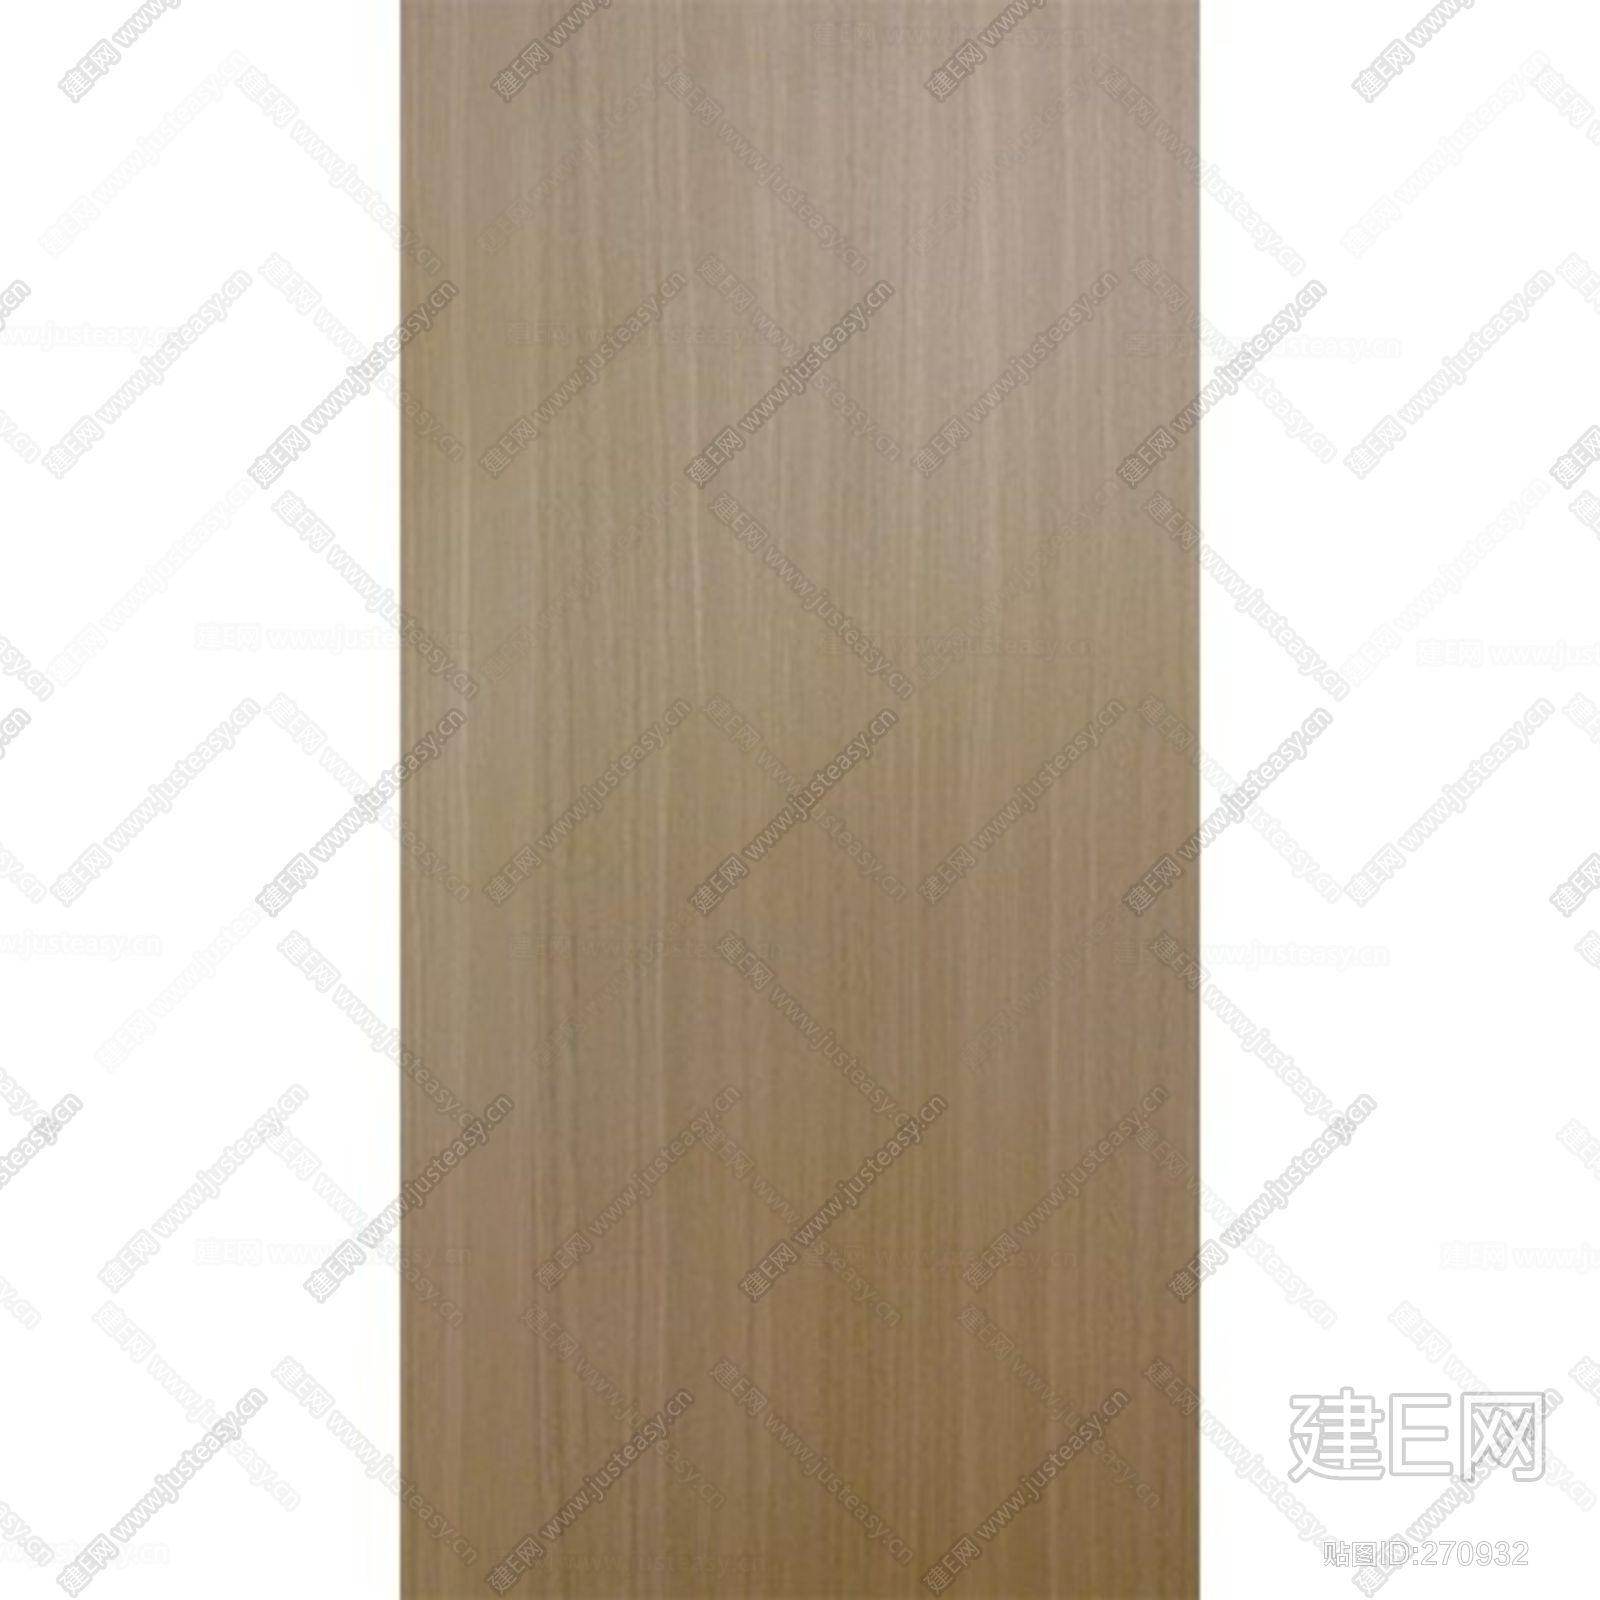 HMH-木韵系列-YDH330黄金城贴图